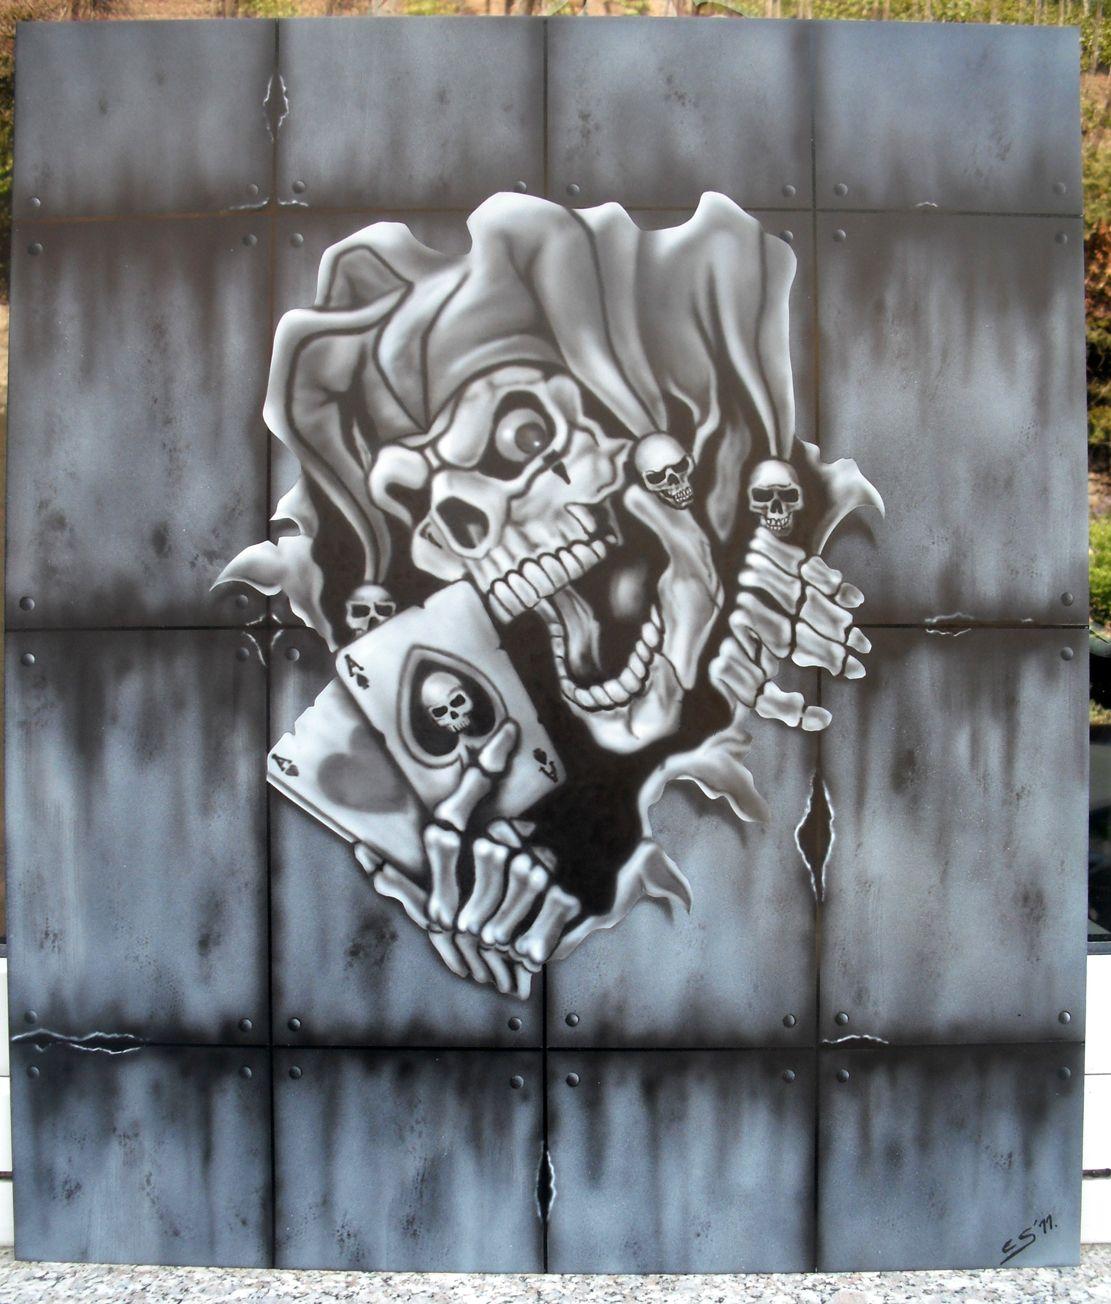 Jester Skull Mural Tattoo Inspiration